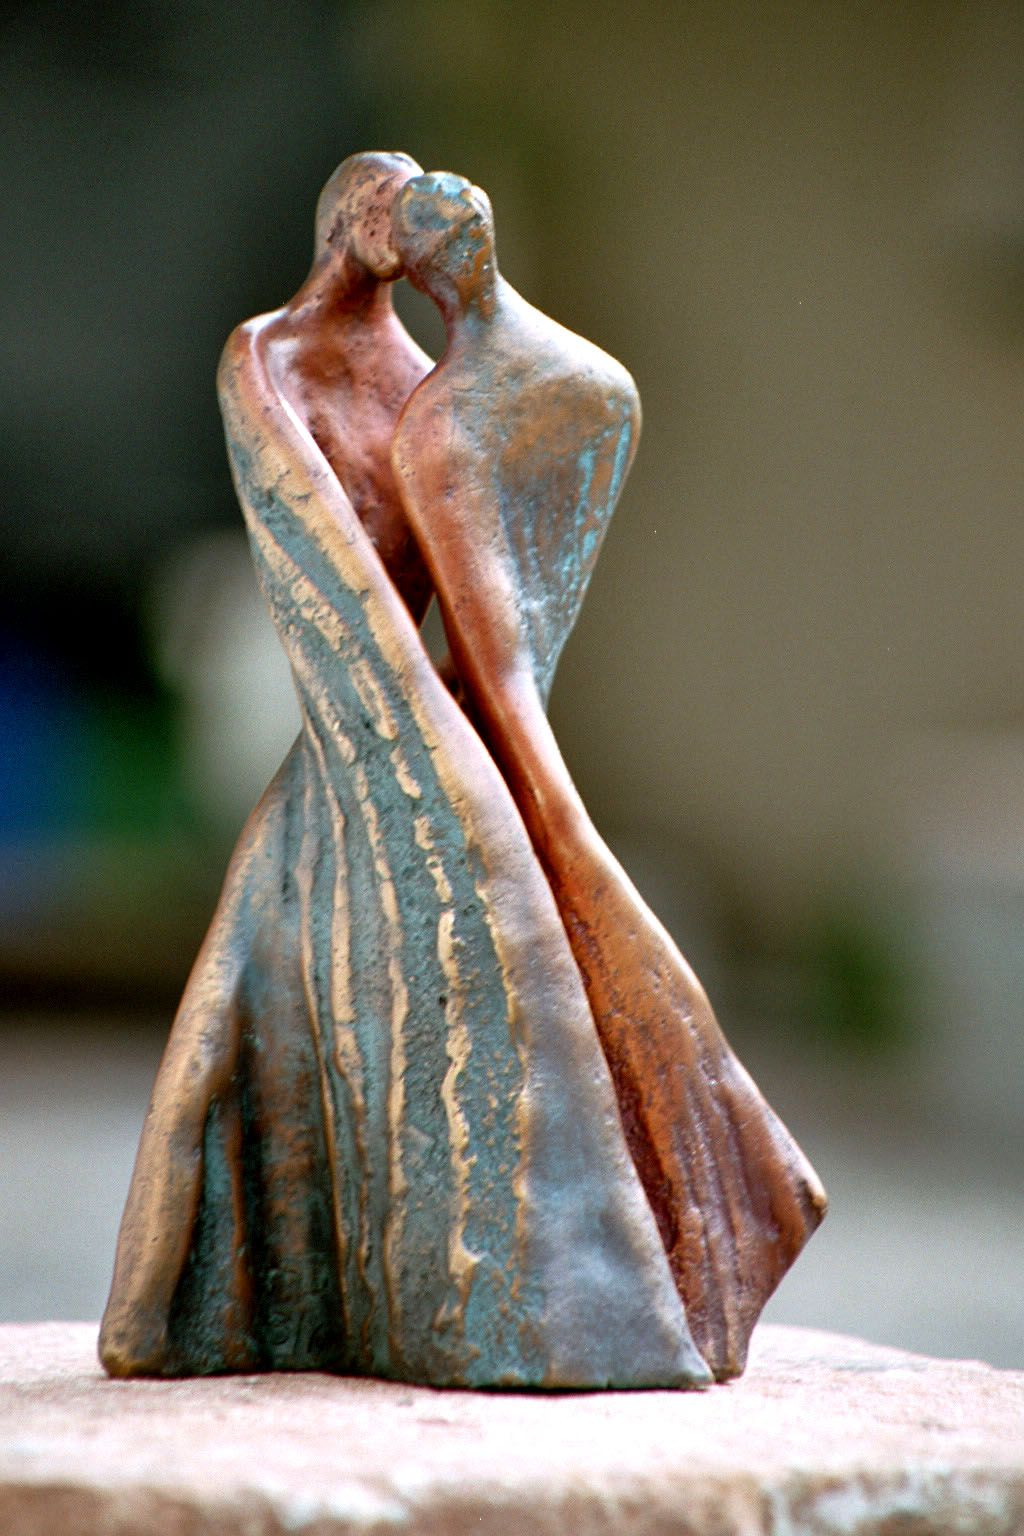 paare keramik atelier maria luise bodirsky kunst skulpturen zeitgenossische skulptur moderne acrylmalerei abstrakt schwarz weiß gemälde